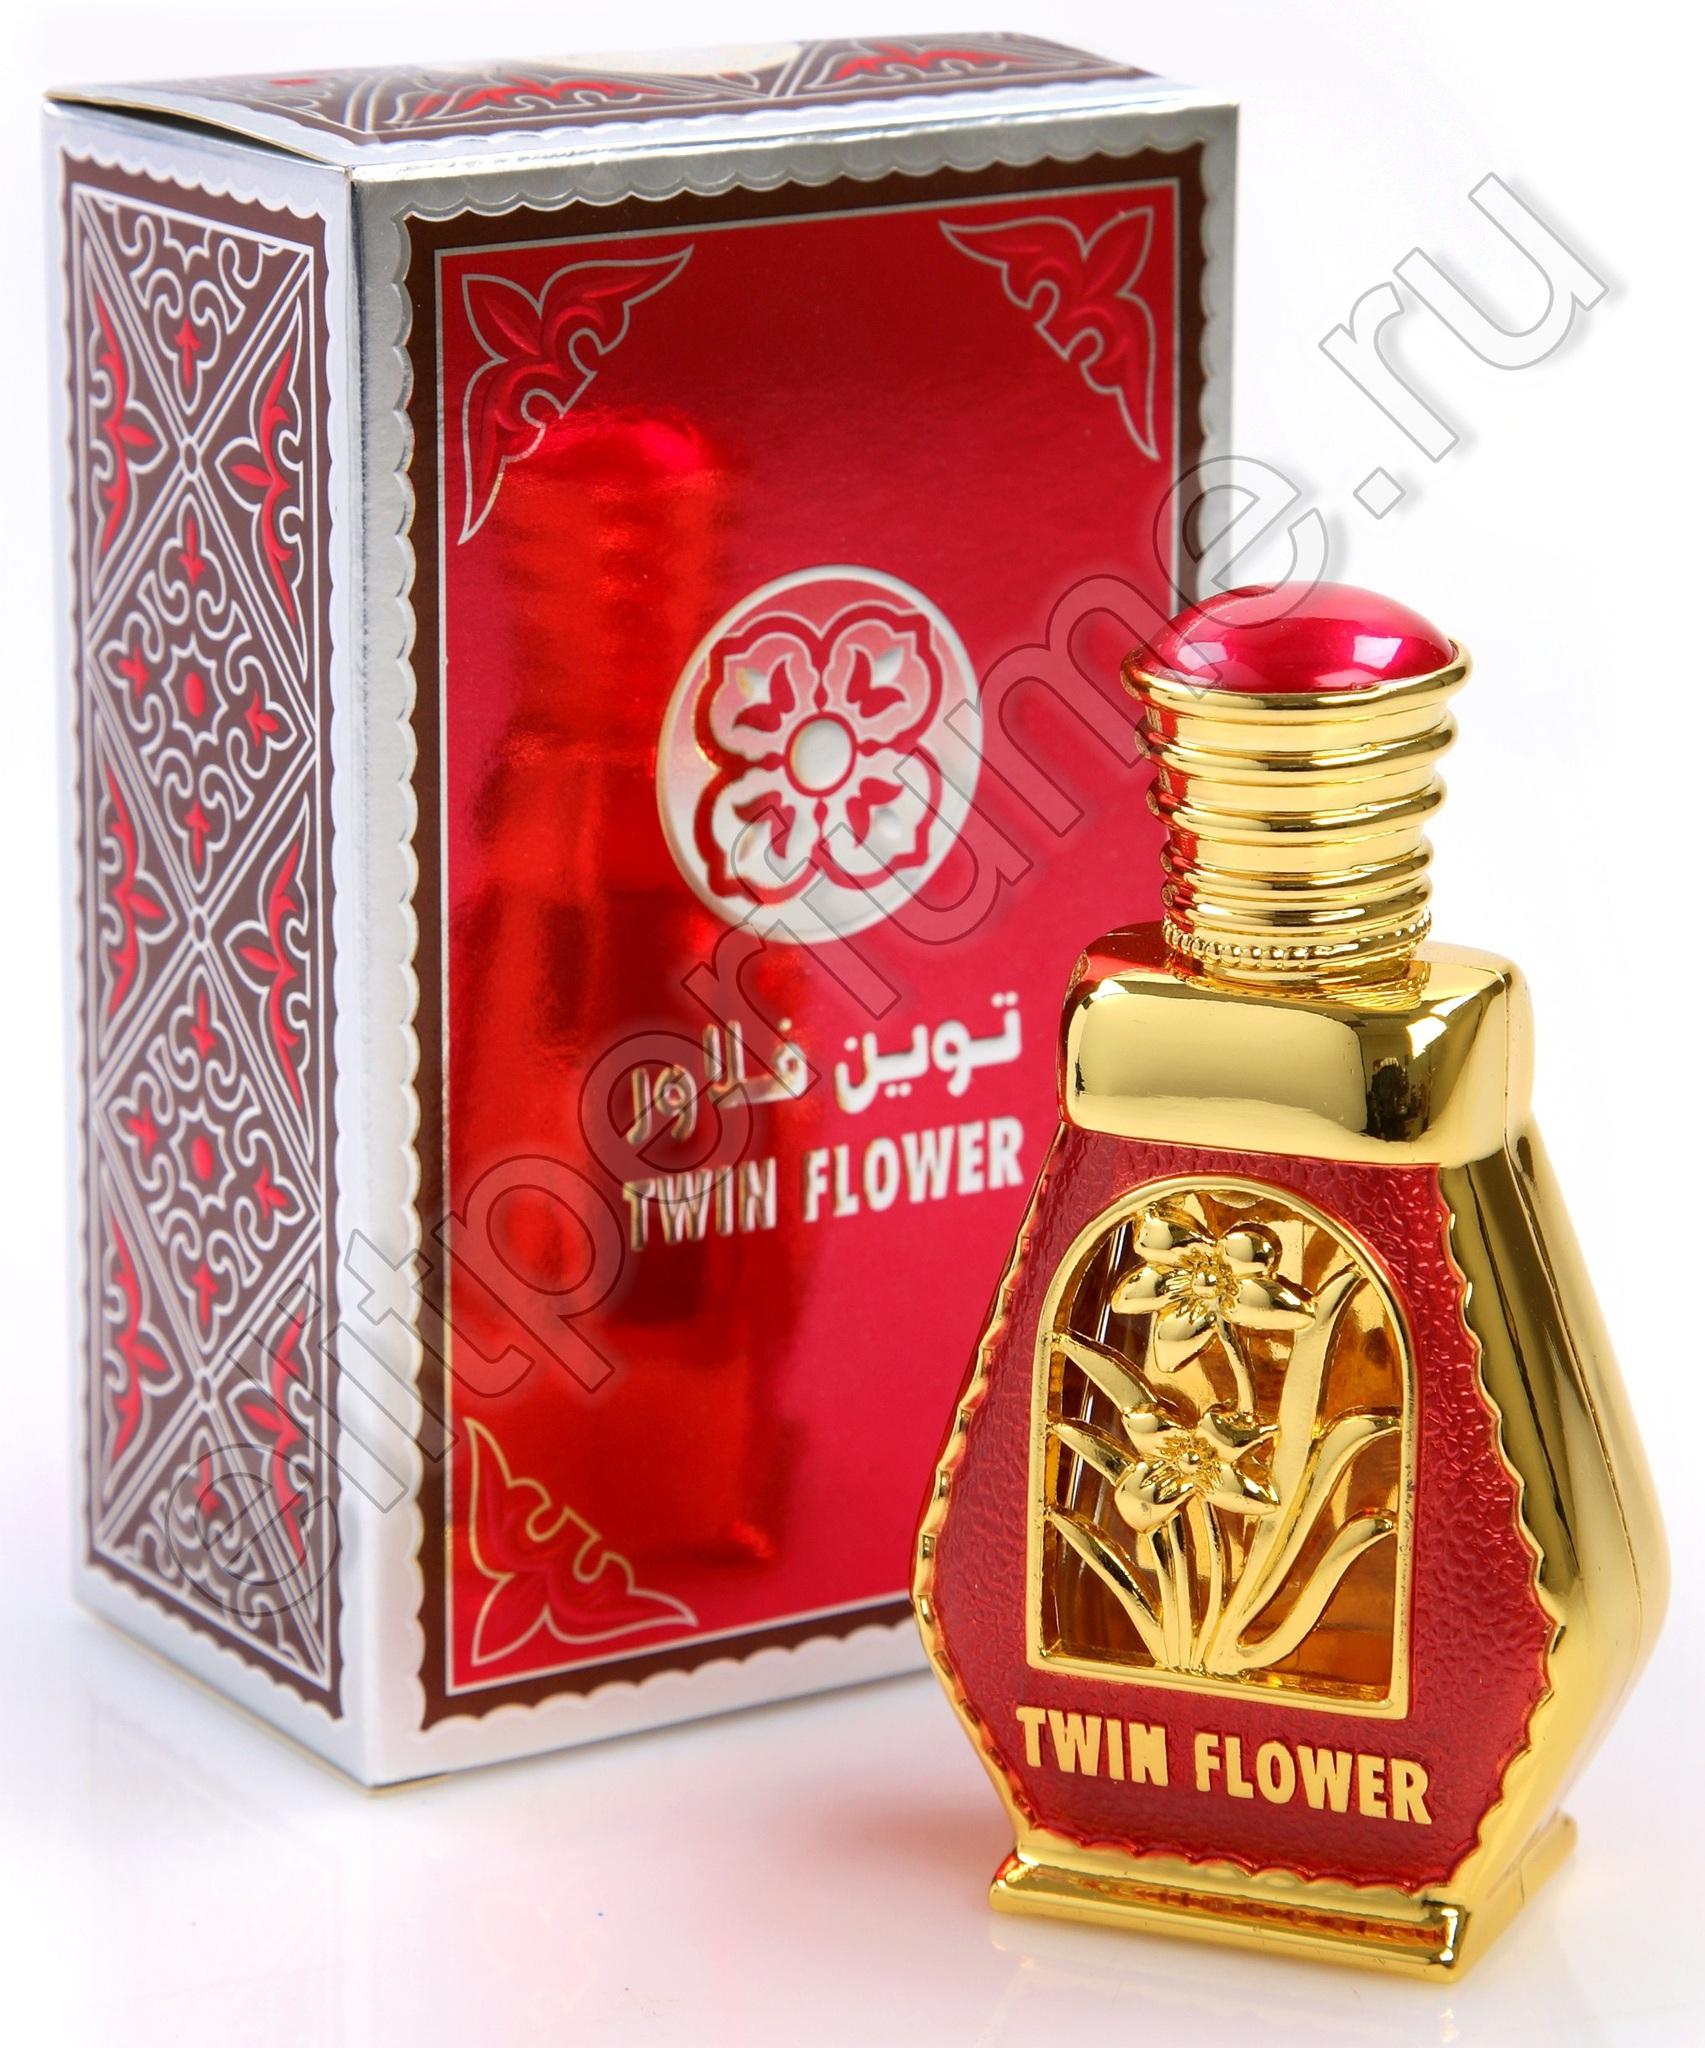 Цветок-близнец Twin Flower 15 мл арабские масляные духи от Аль Харамайн Al Haramain Perfumes